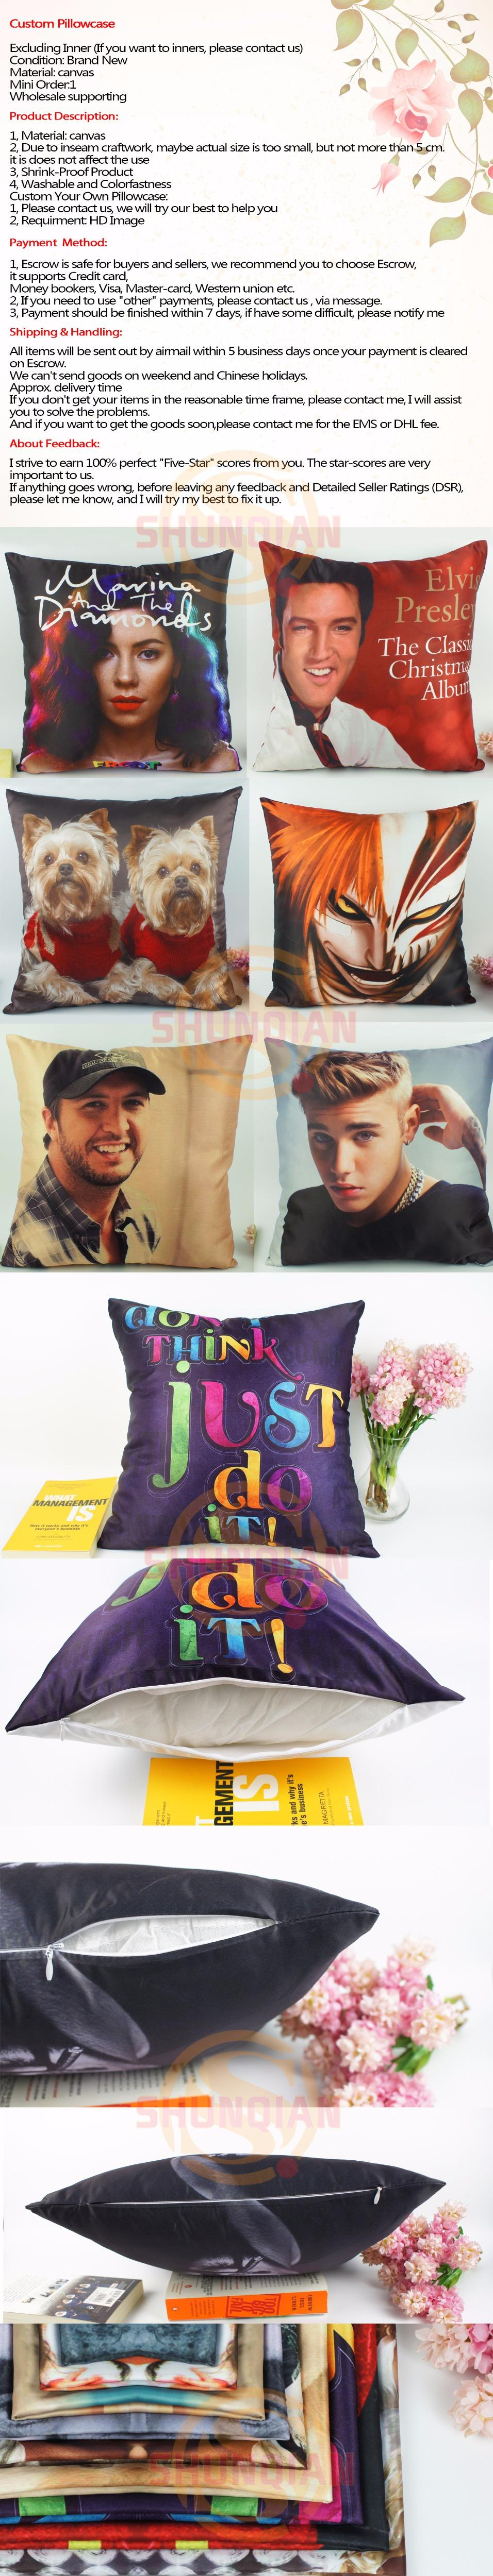 Hot Sale Daft Punk Pillowcase Wedding Decorative Pillow Case Customize Gift For Pillow Cover A311&56